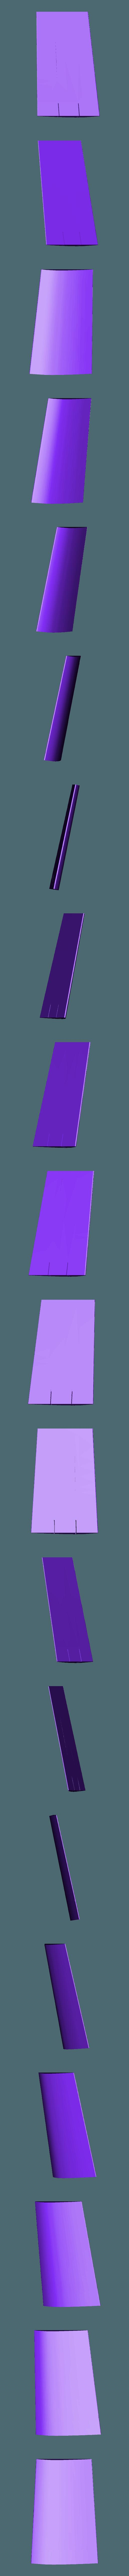 Thinner_Wing_Right_Inner.stl Download free STL file Flyer Mk. 1 • 3D printing object, billbo1958